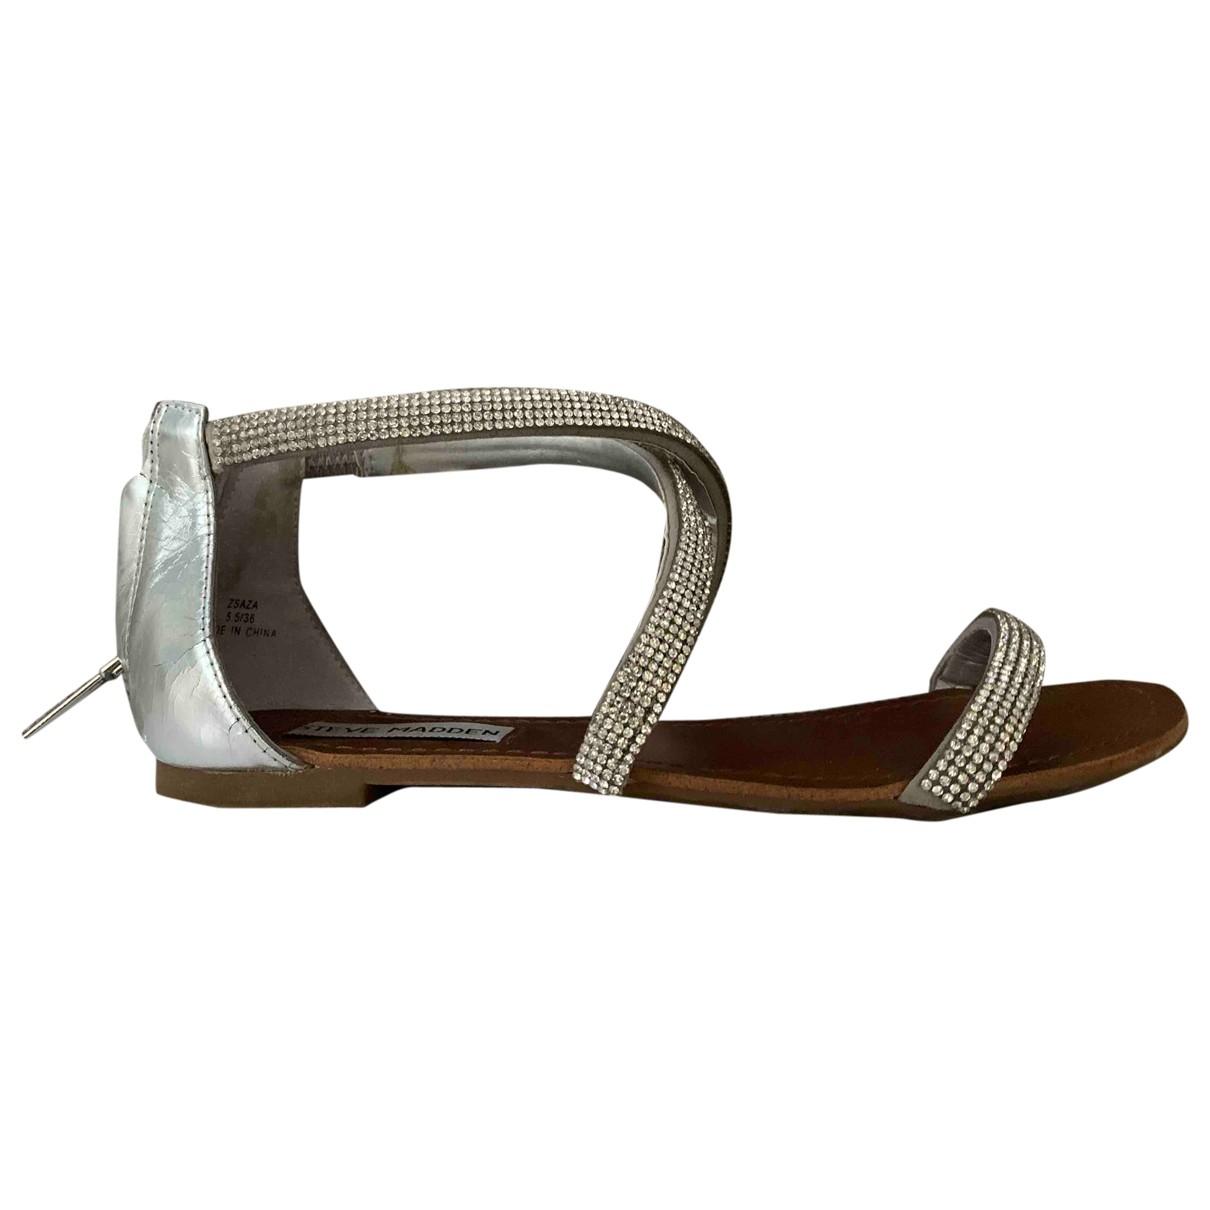 Steve Madden - Sandales   pour femme en cuir - argente